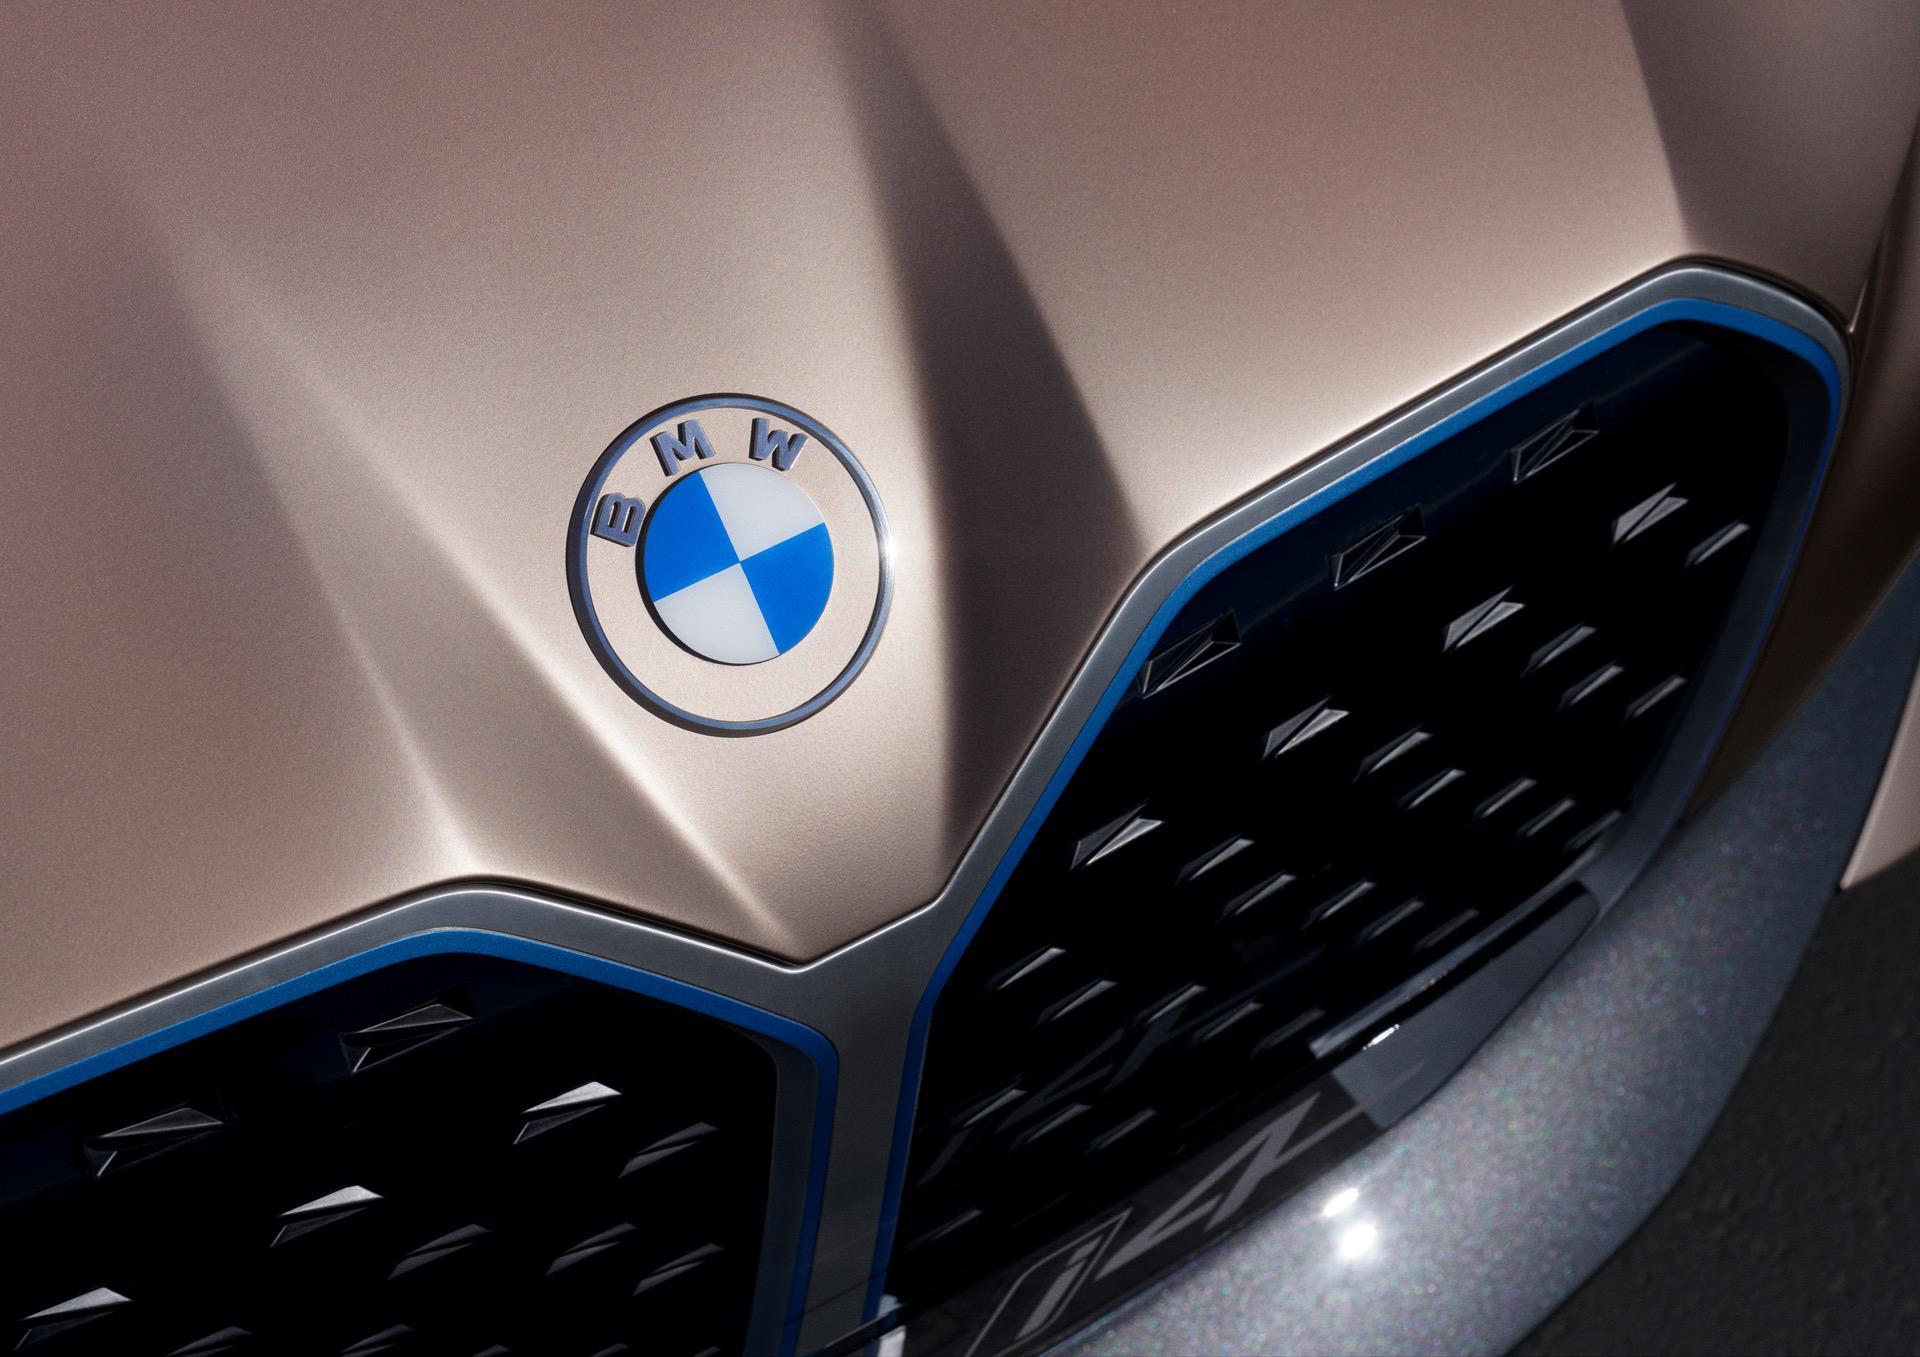 BMW Concept i4 images 11